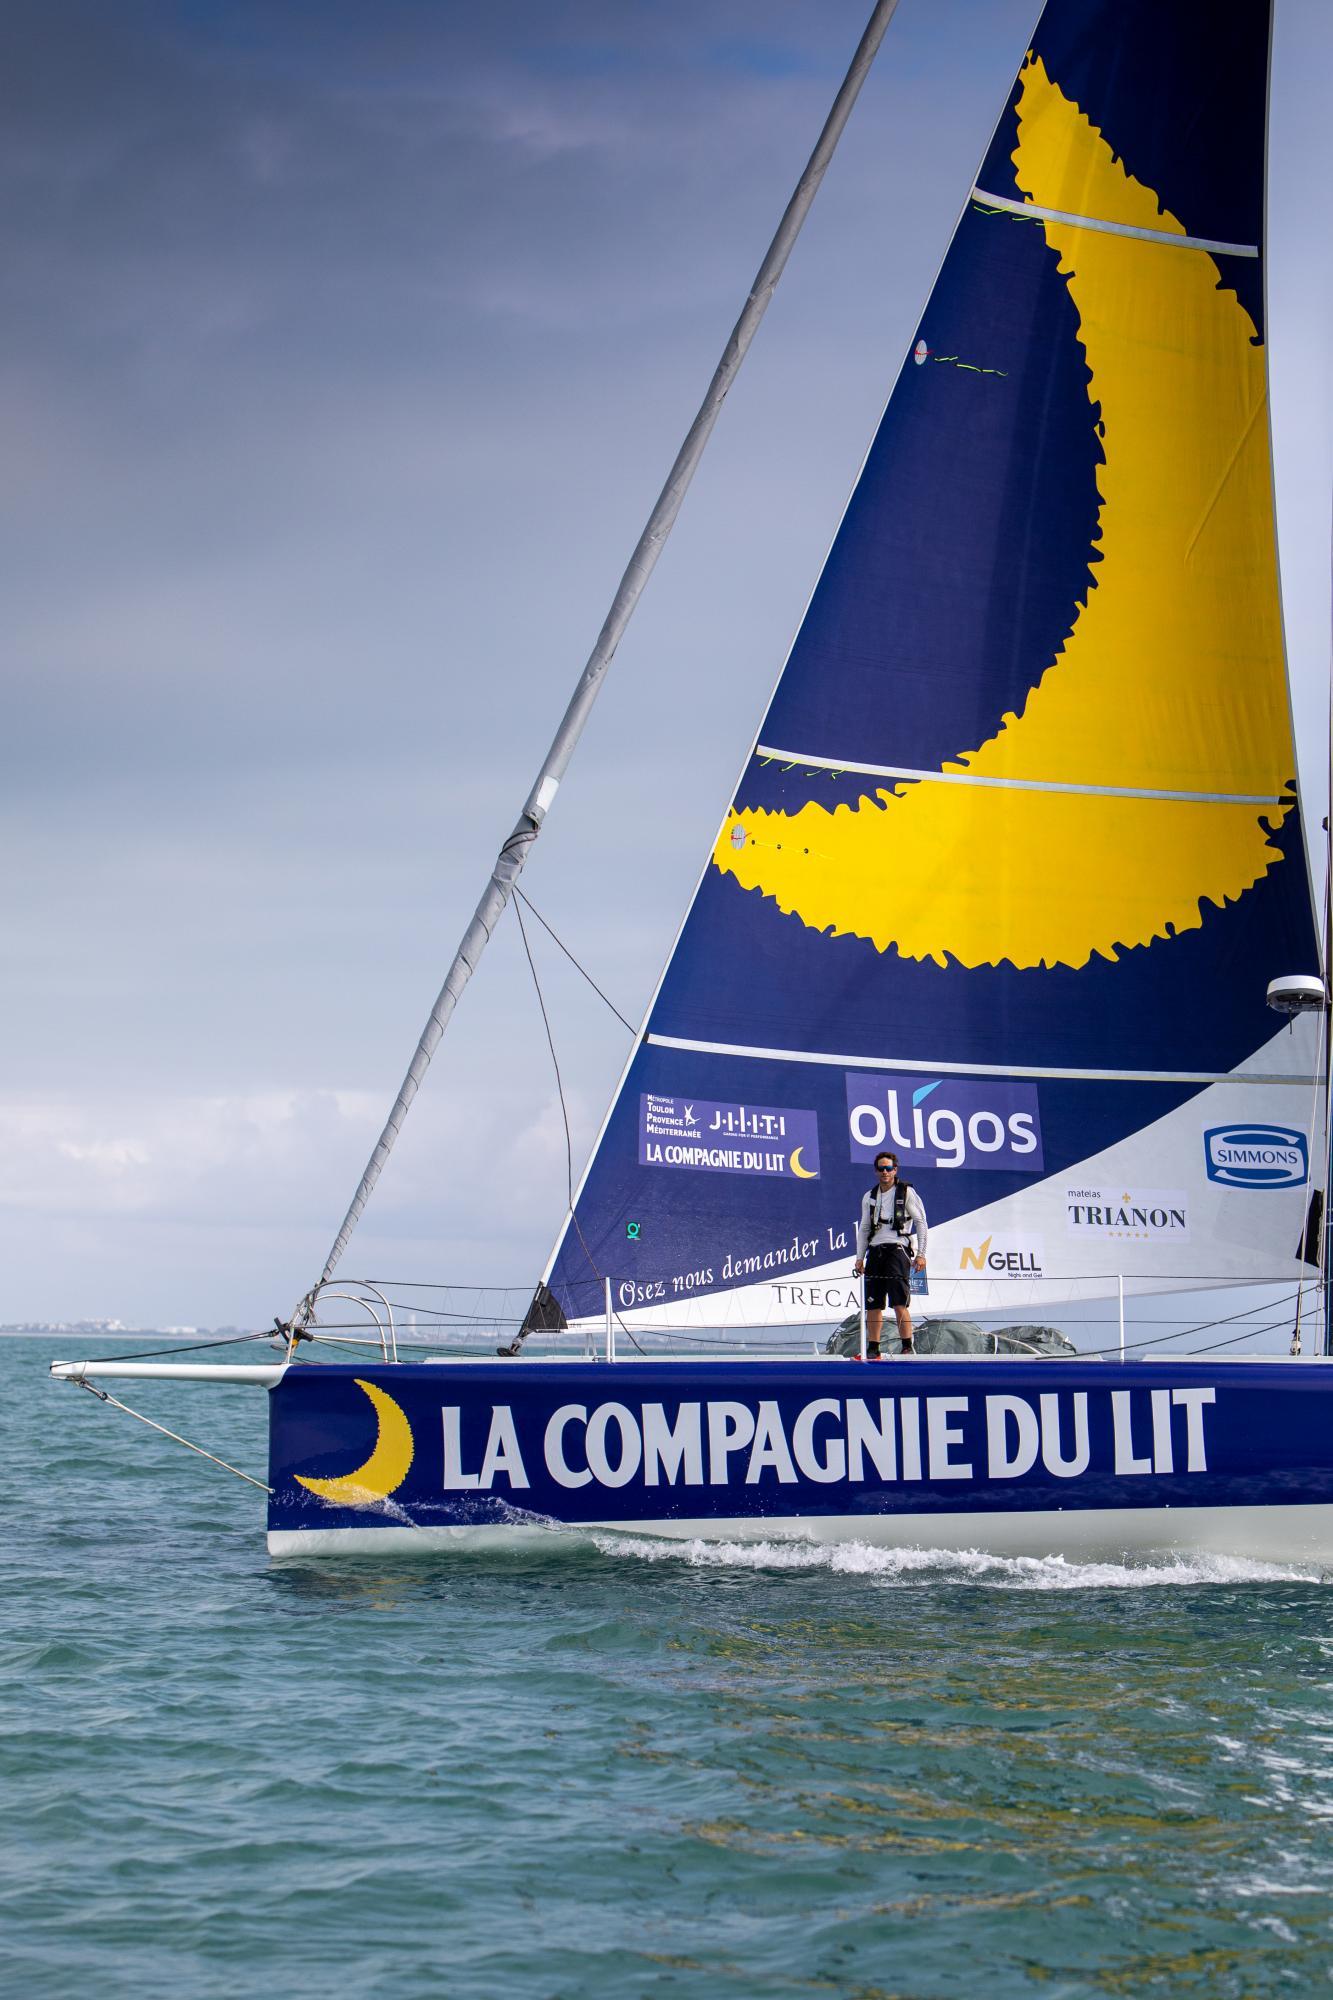 Imoca Compagnie du Lit / Jiliti - Skipper Clément Giraud © Vincent Olivaud